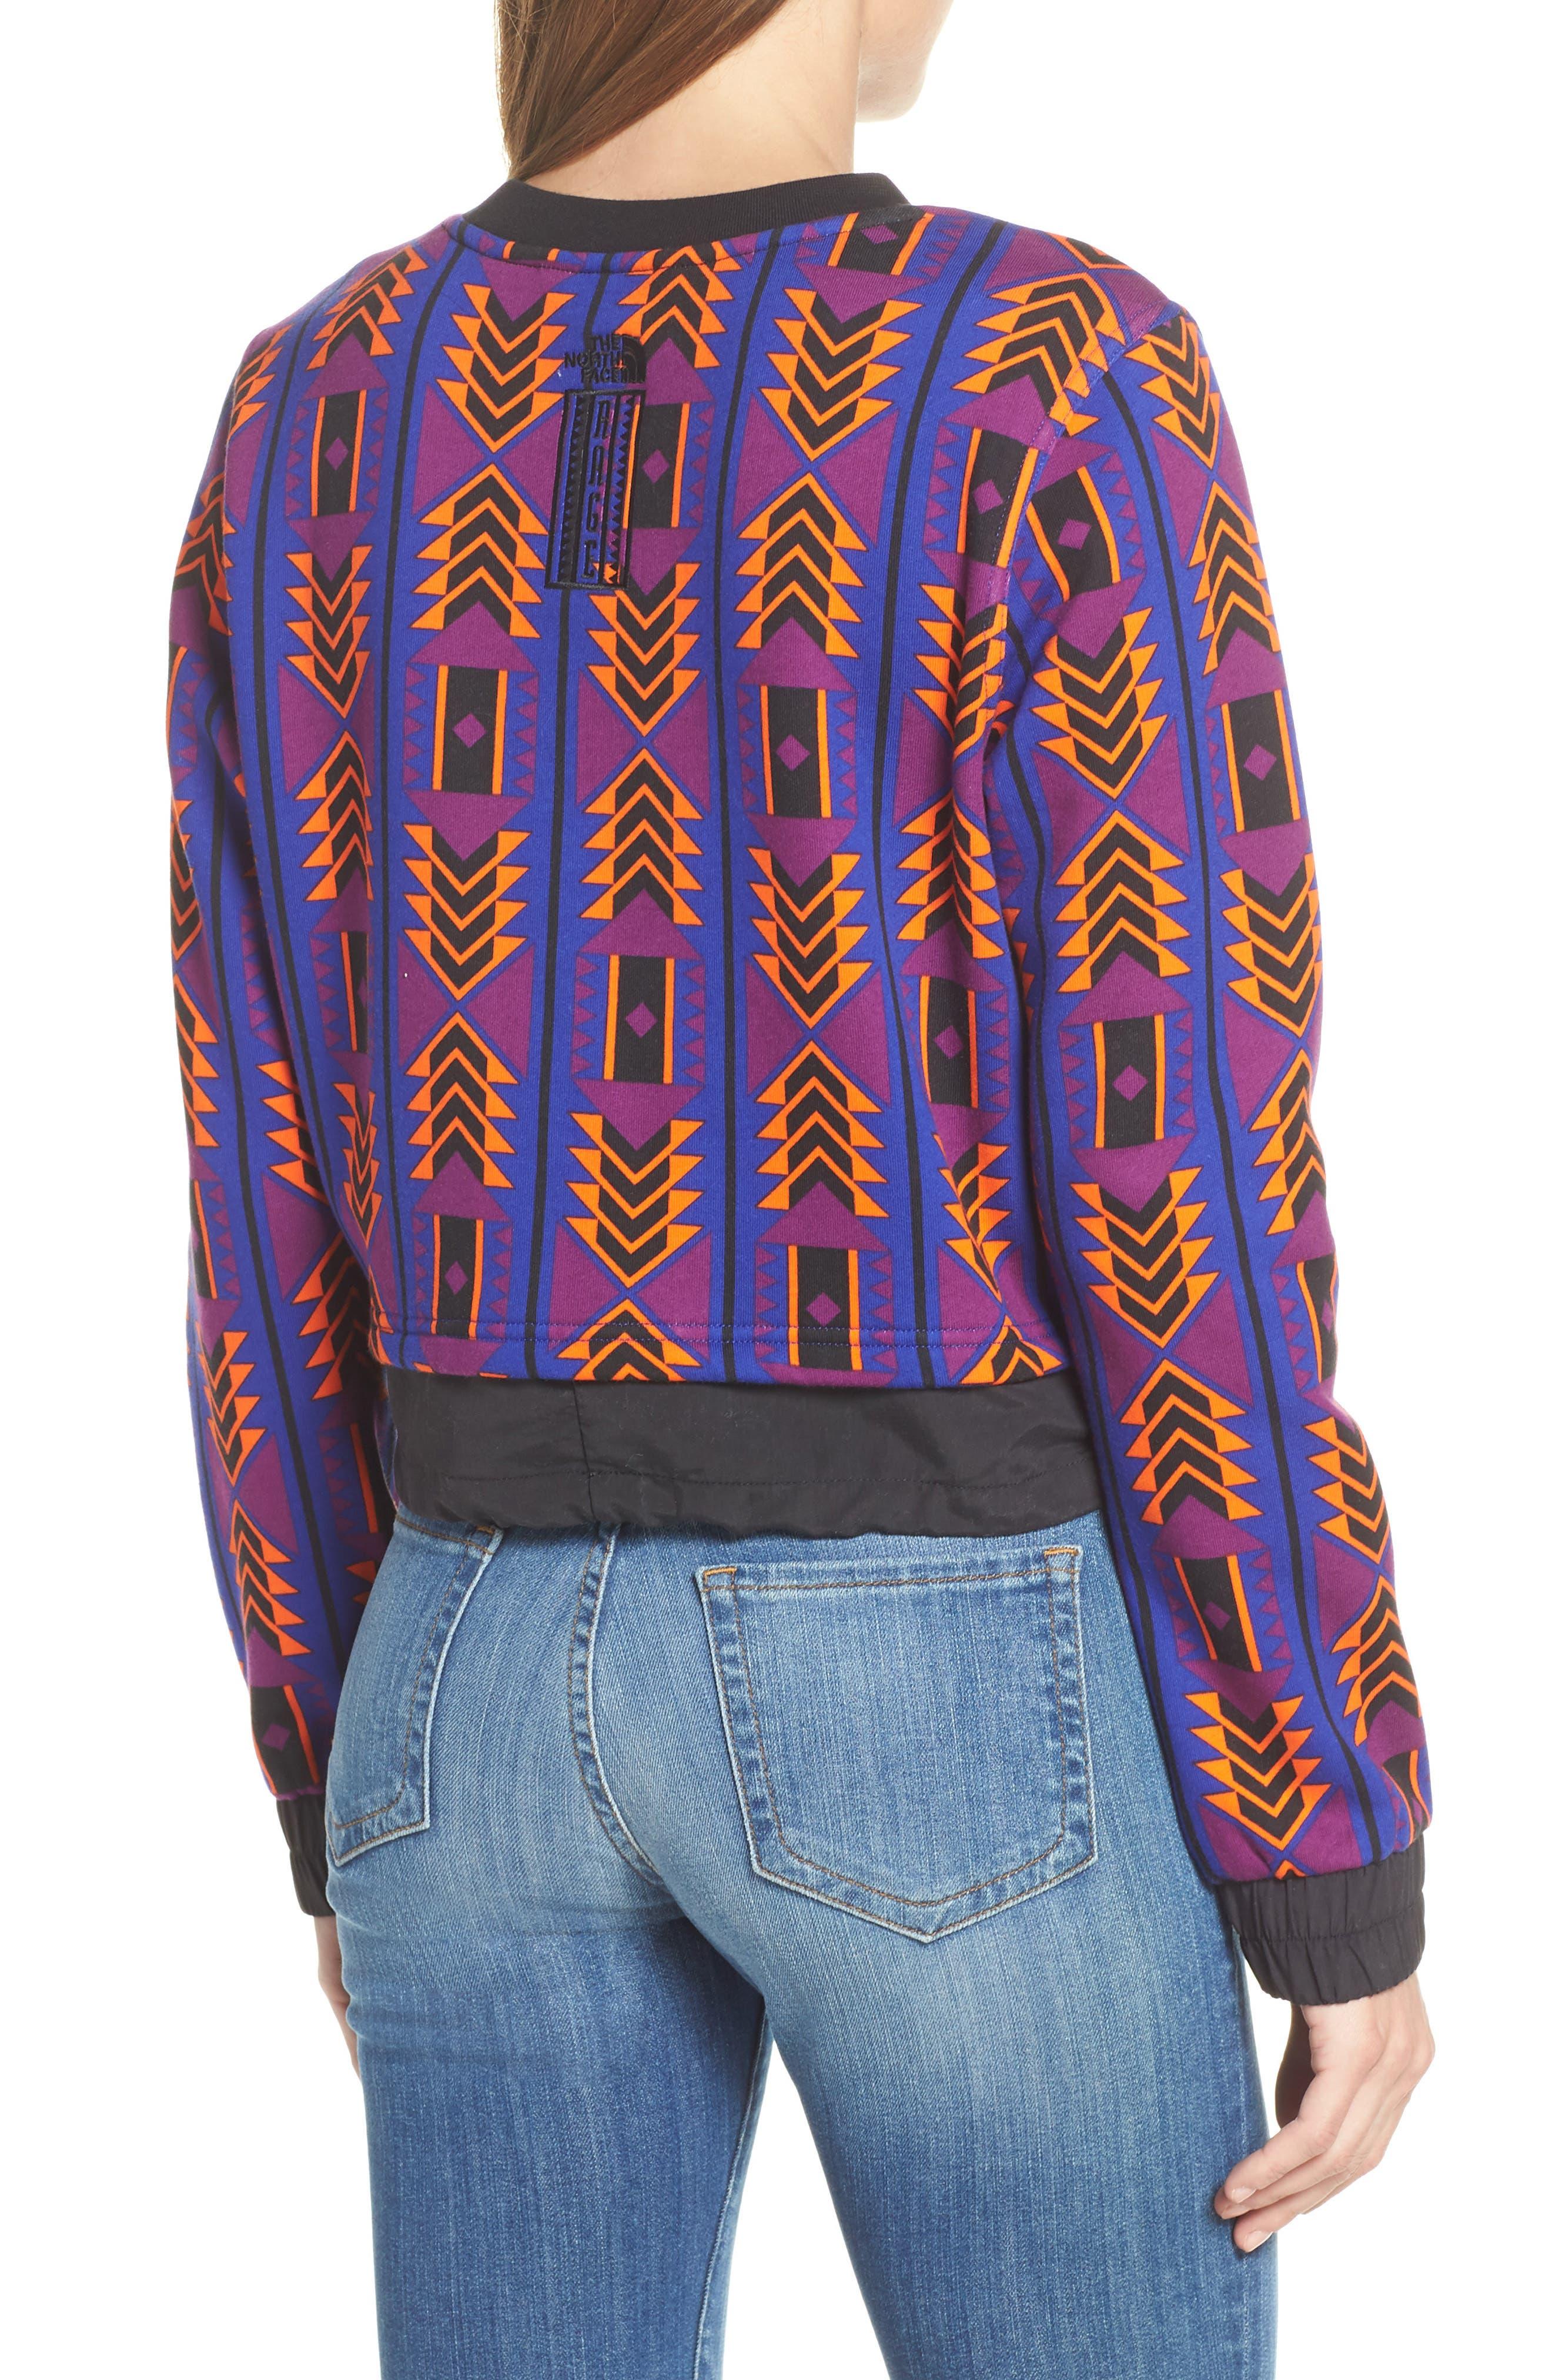 92 Rage Crop Fleece Sweatshirt,                             Alternate thumbnail 2, color,                             AZTEC BLUE 1992 RAGE PRINT